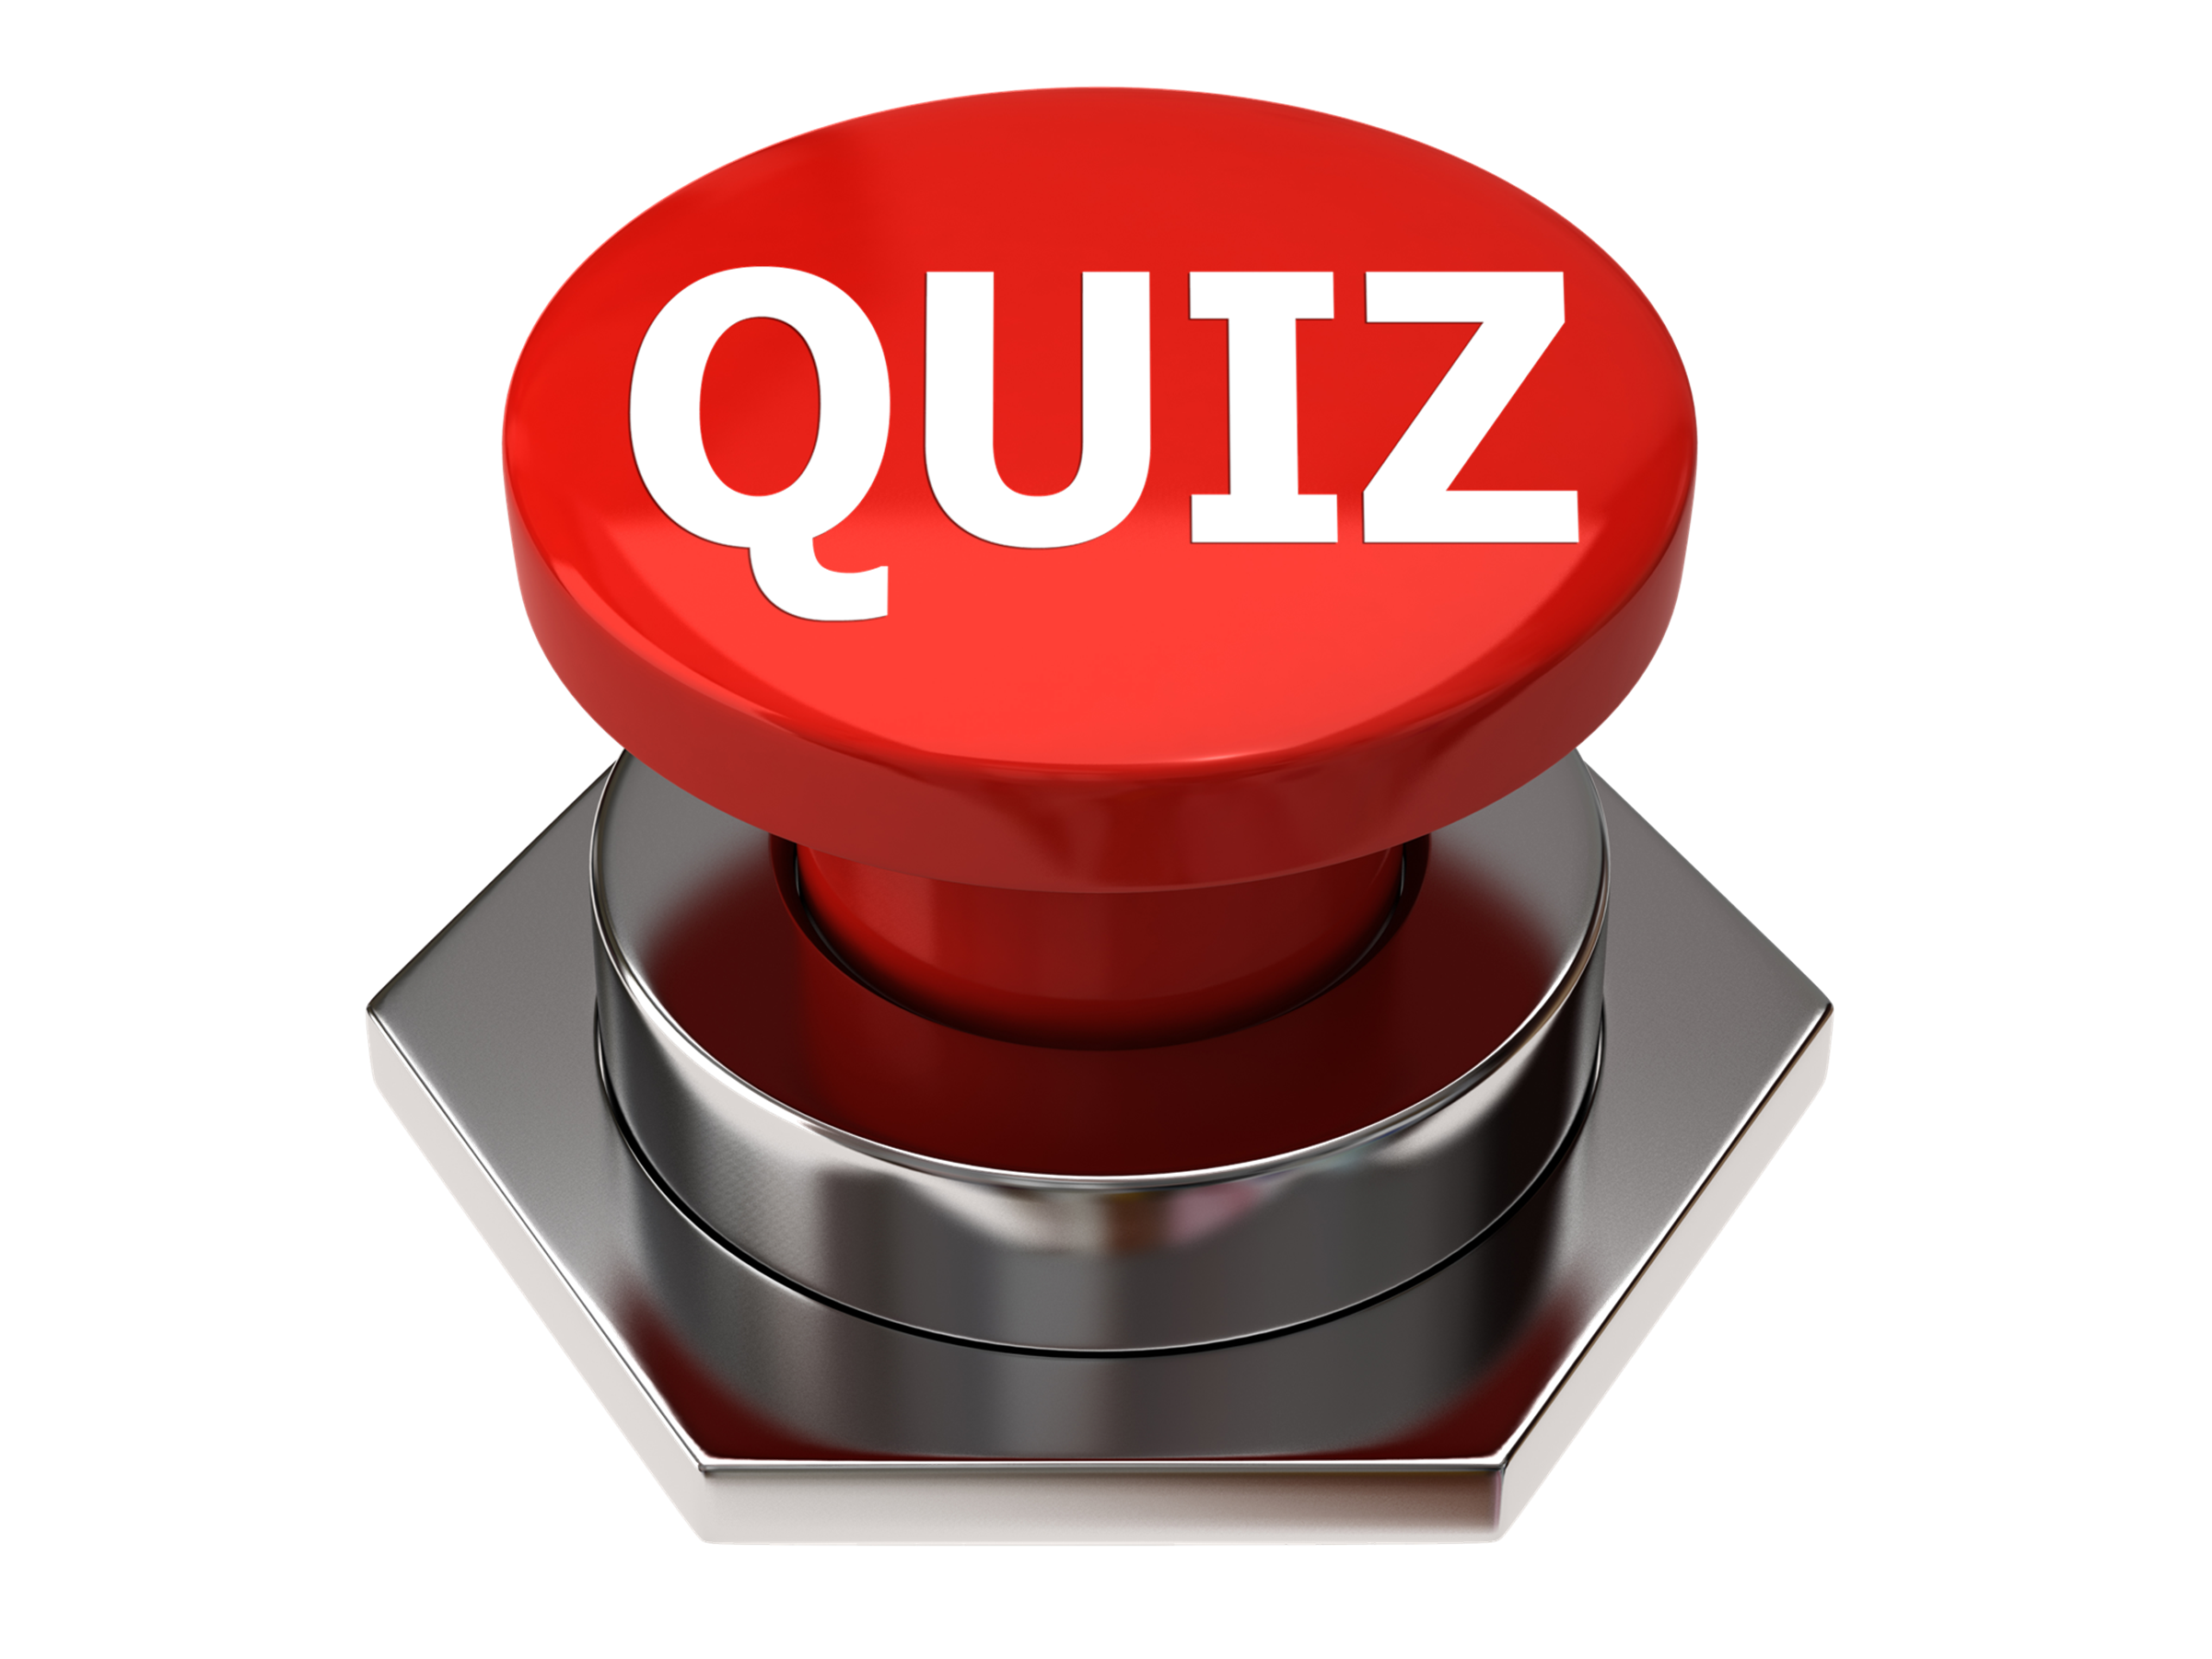 Sherlock Holmes clipart quiz time Fasab test 02 Quiz_button